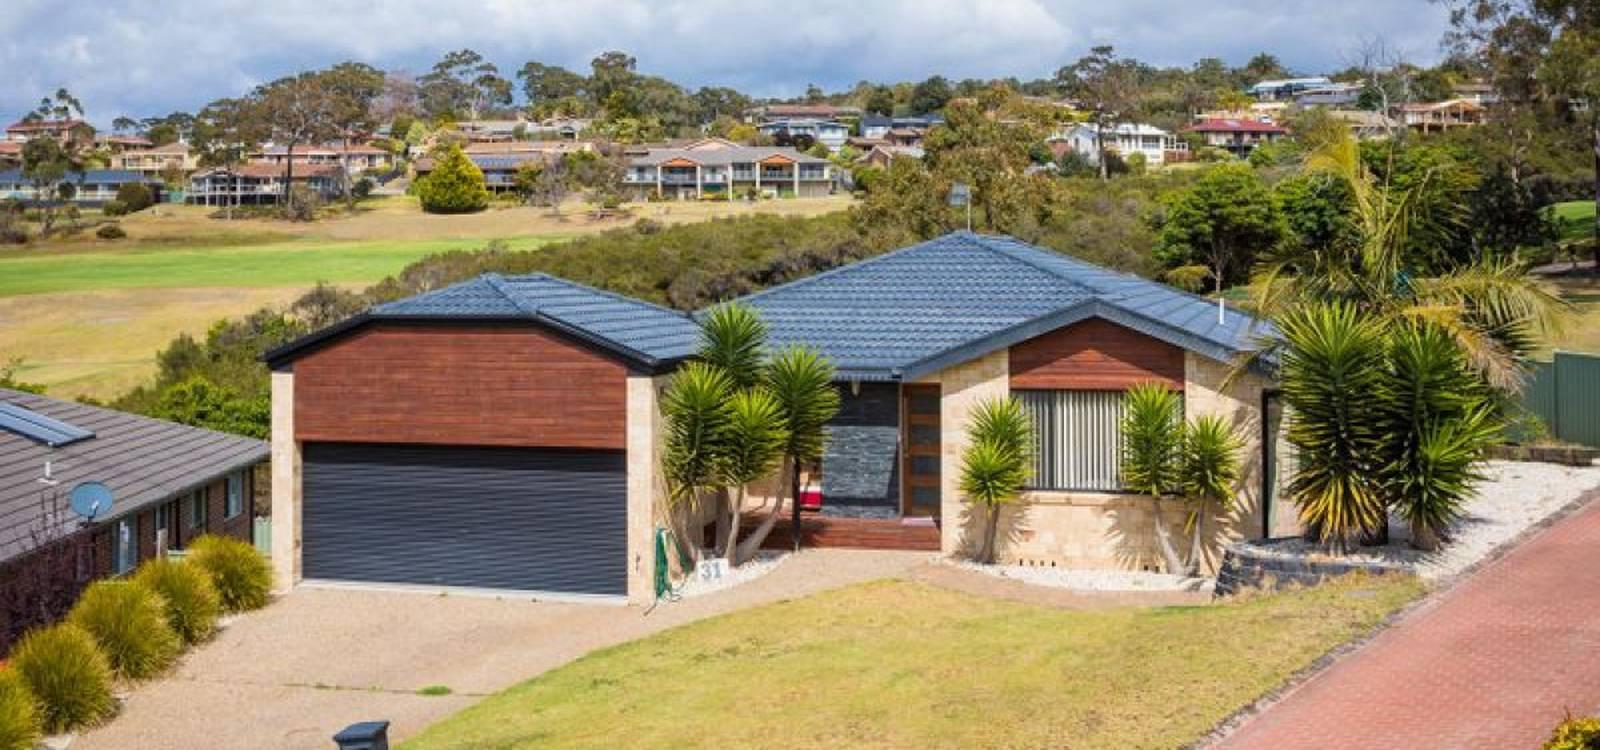 31 The Peninsula TURA BEACH, NSW 2548 - photo 1